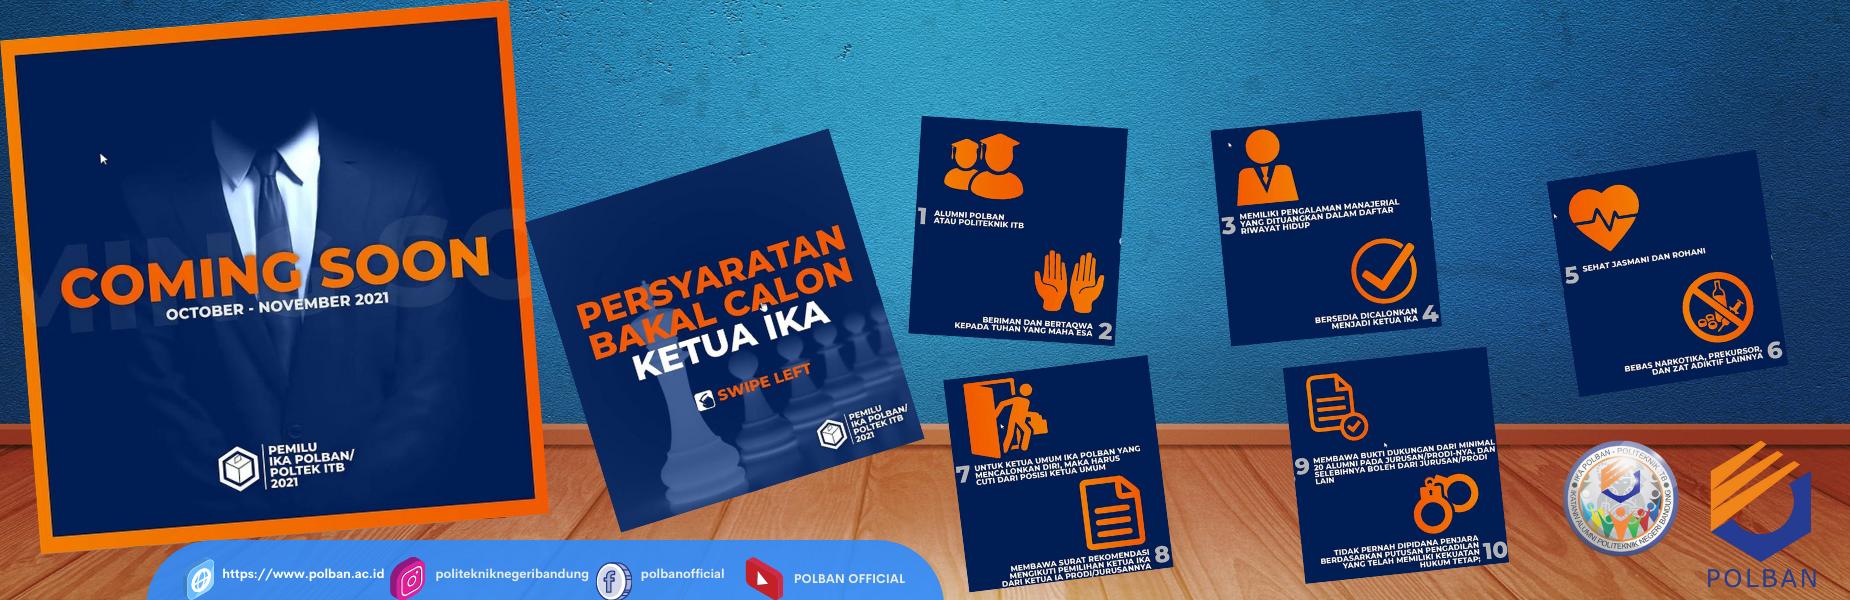 #Pemilu_IKA_POLBAN_POLTEKITB